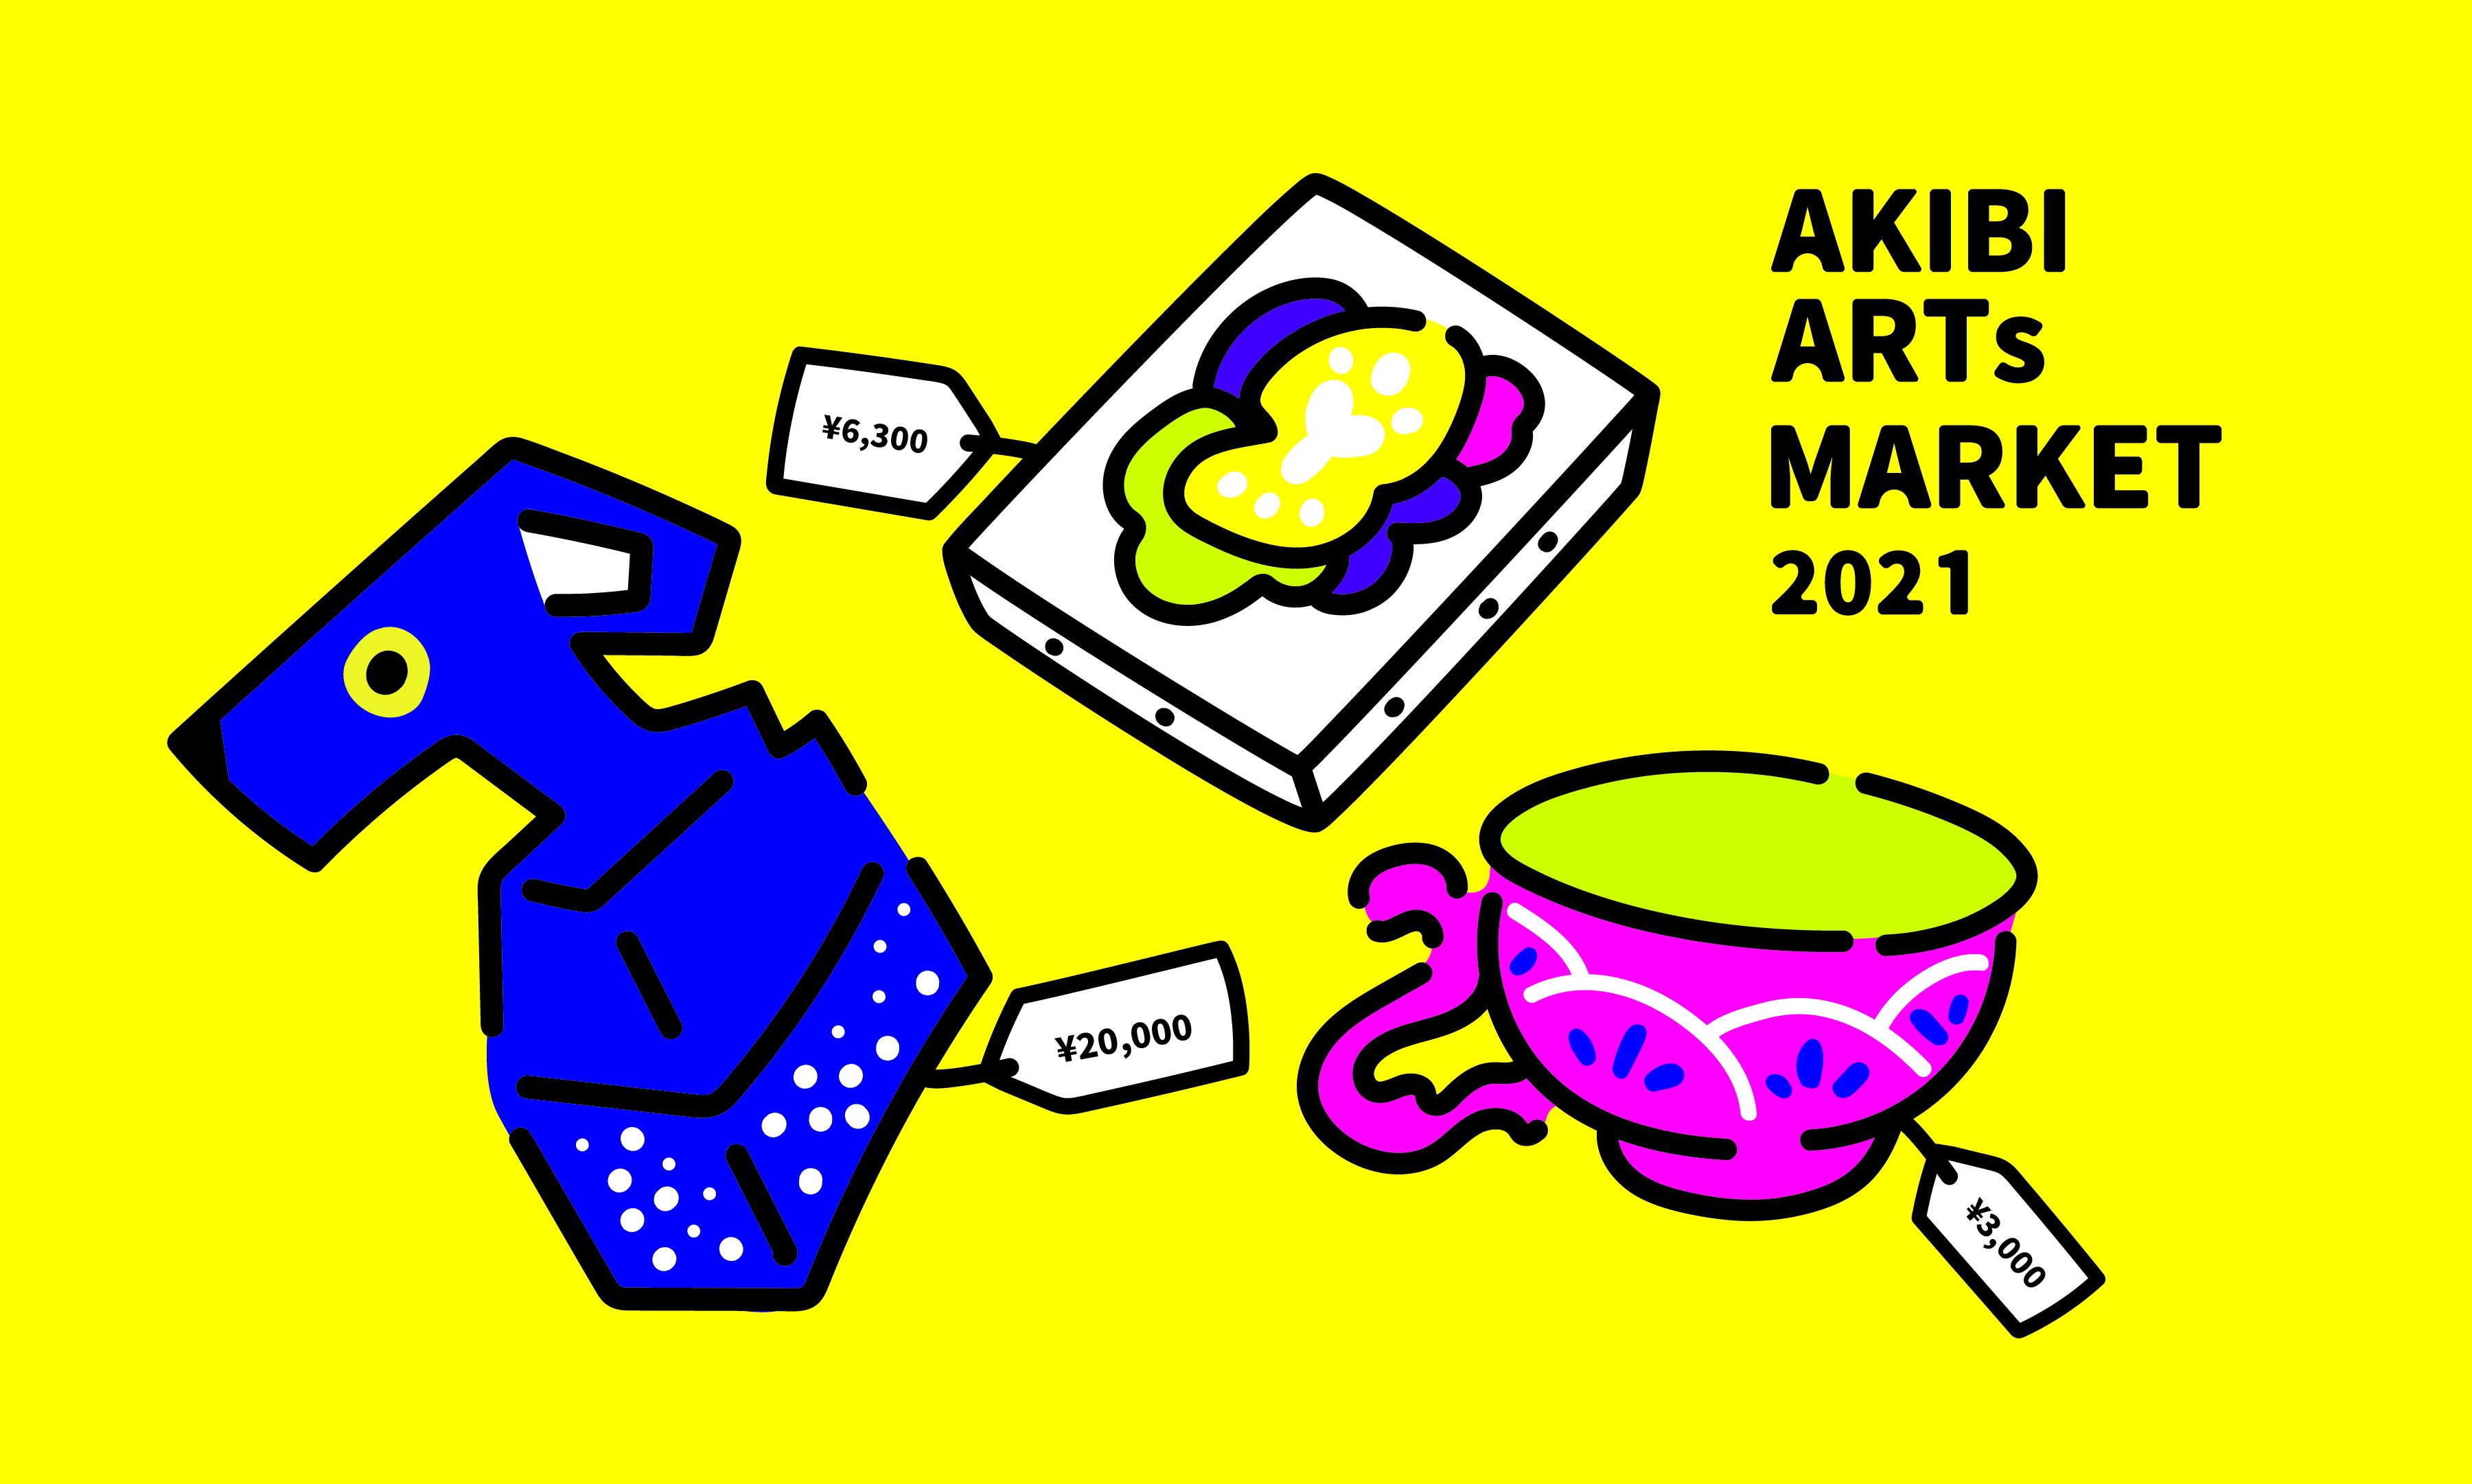 「AKIBI ARTs MARKET 2021」